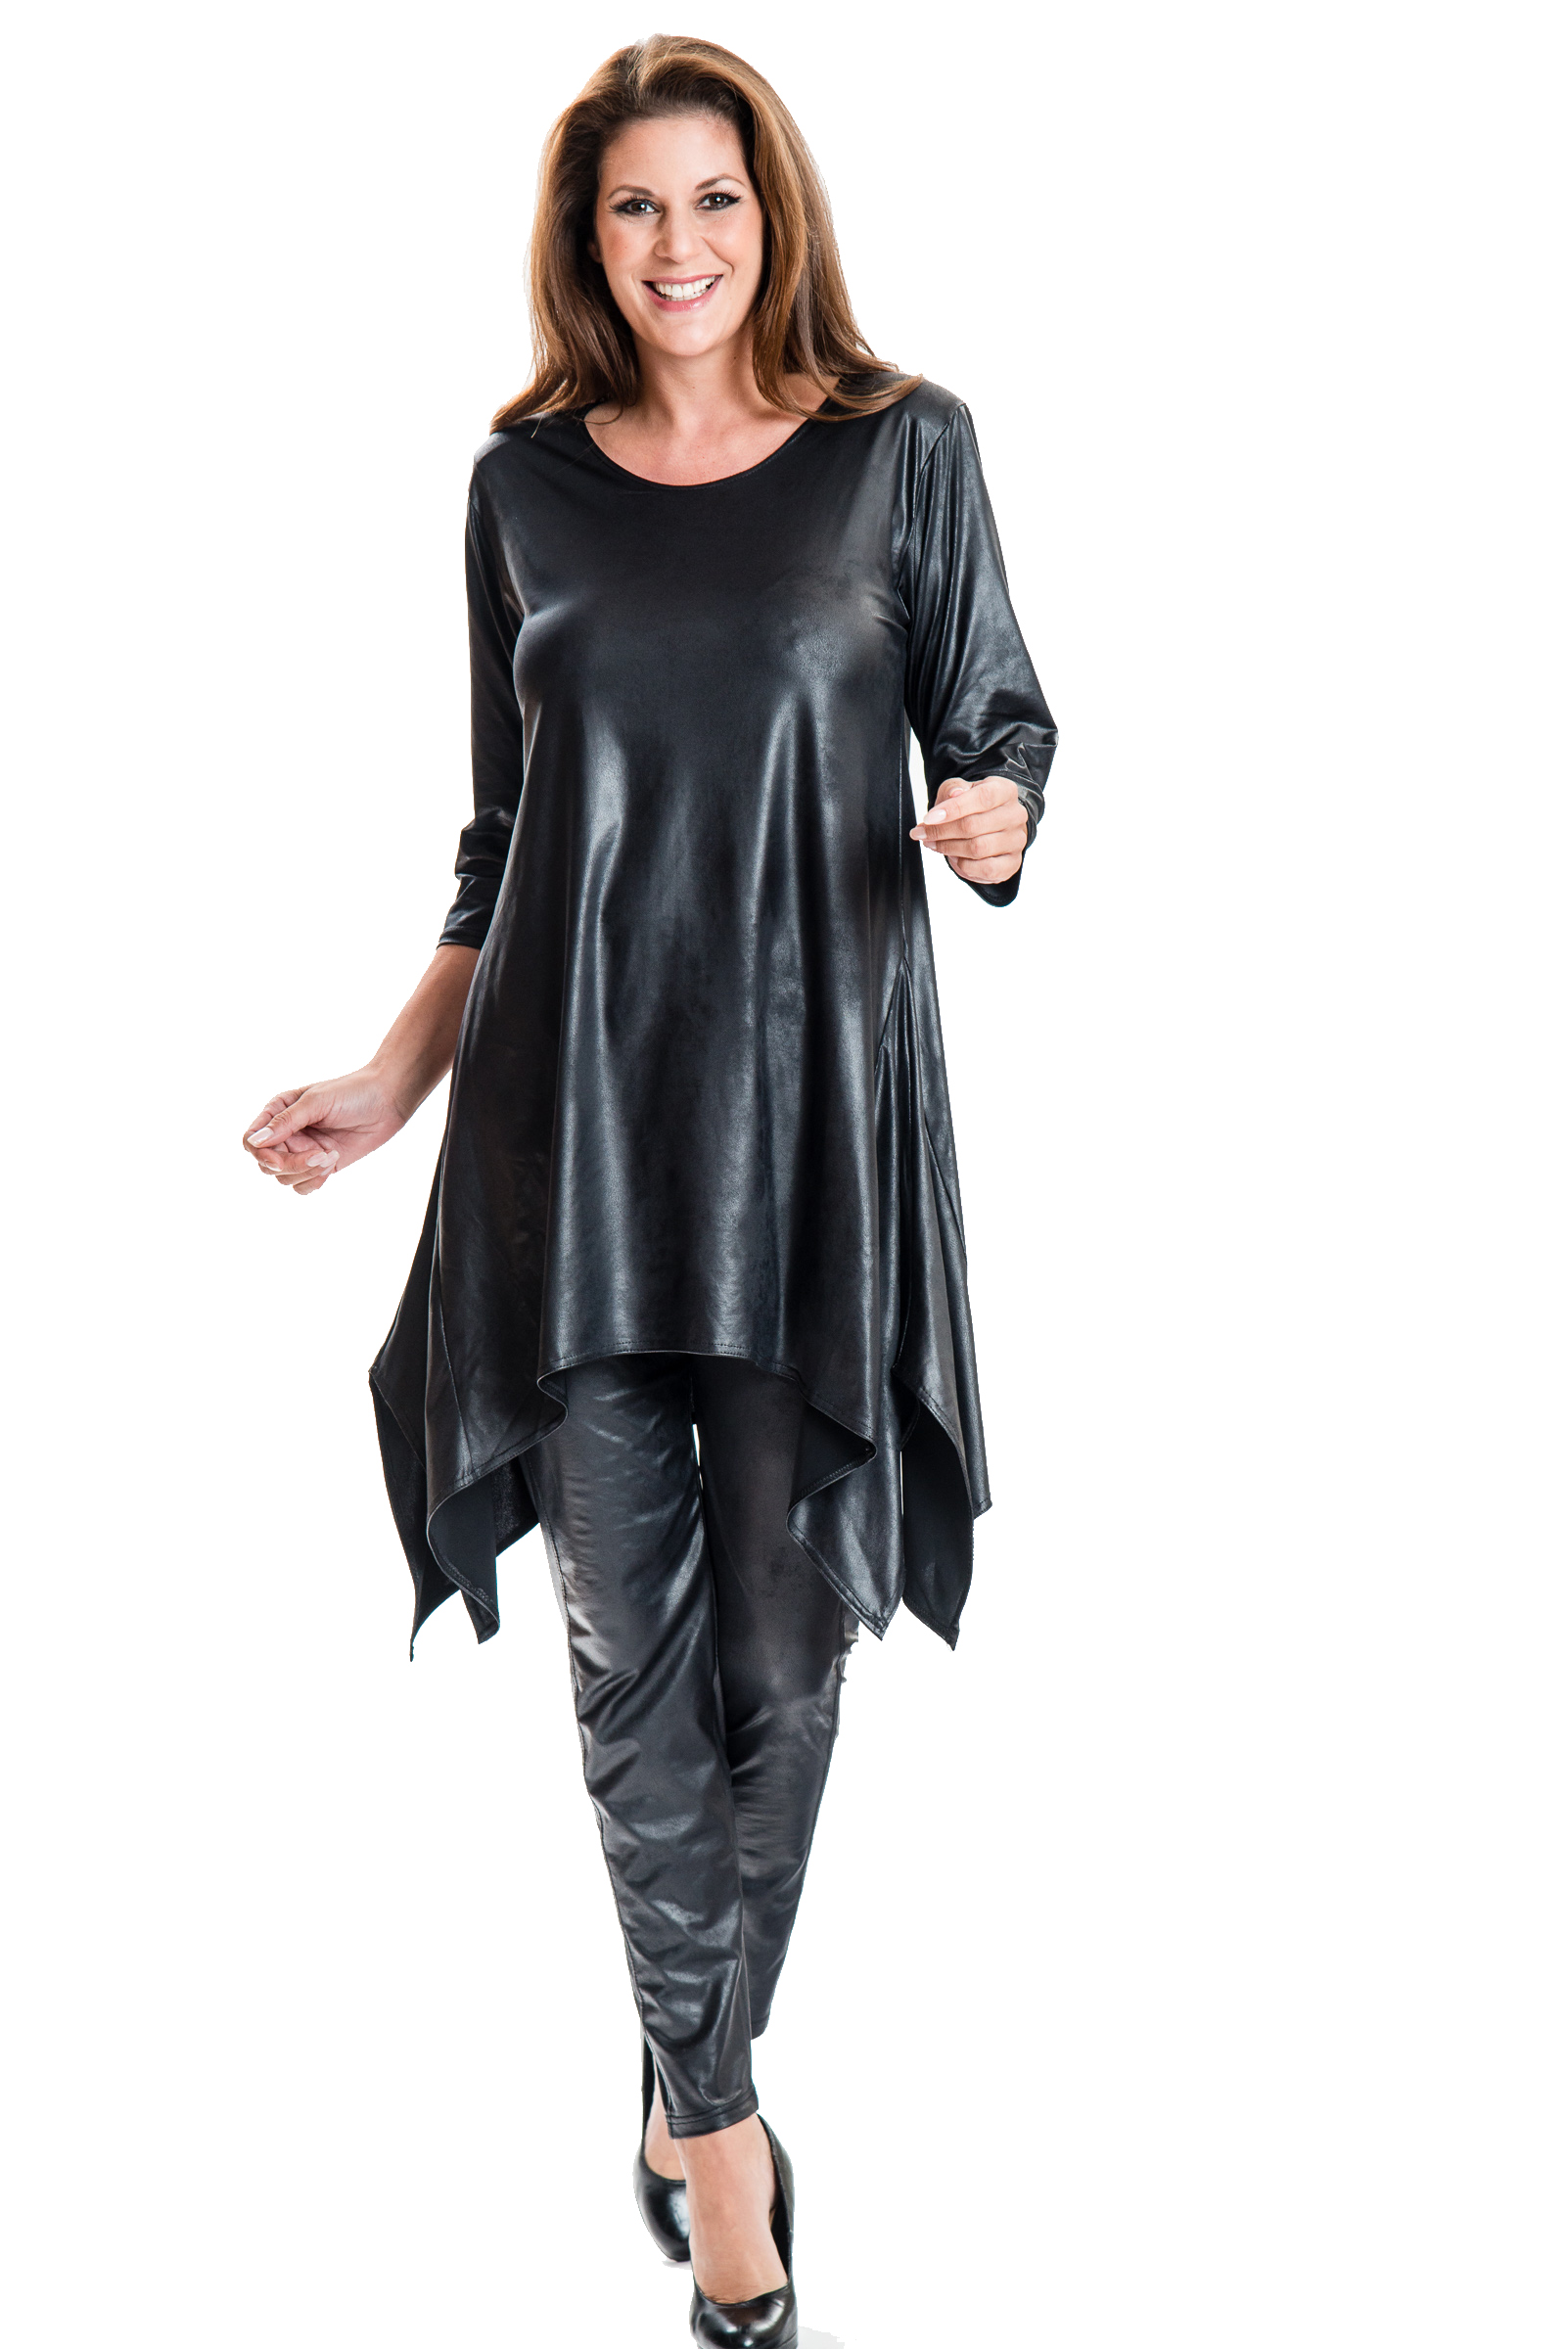 Damen Tunika schwarz Abendkleid Partykleid Leder Optik Look ...